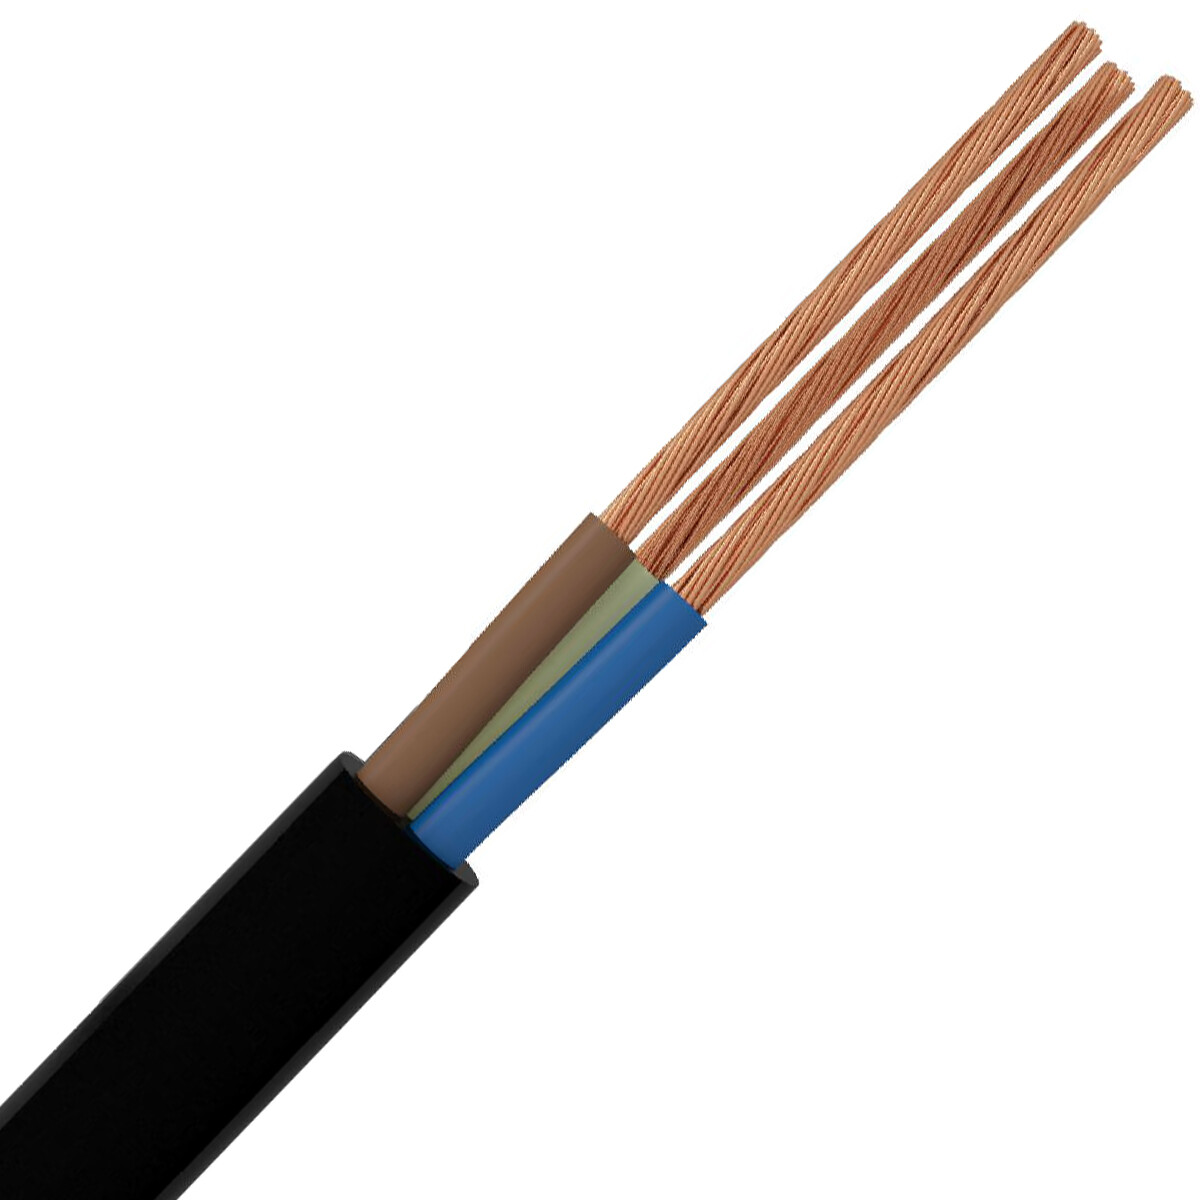 Stroomkabel - 3x2.5mm - 3 Aderig - 1 Meter - Zwart